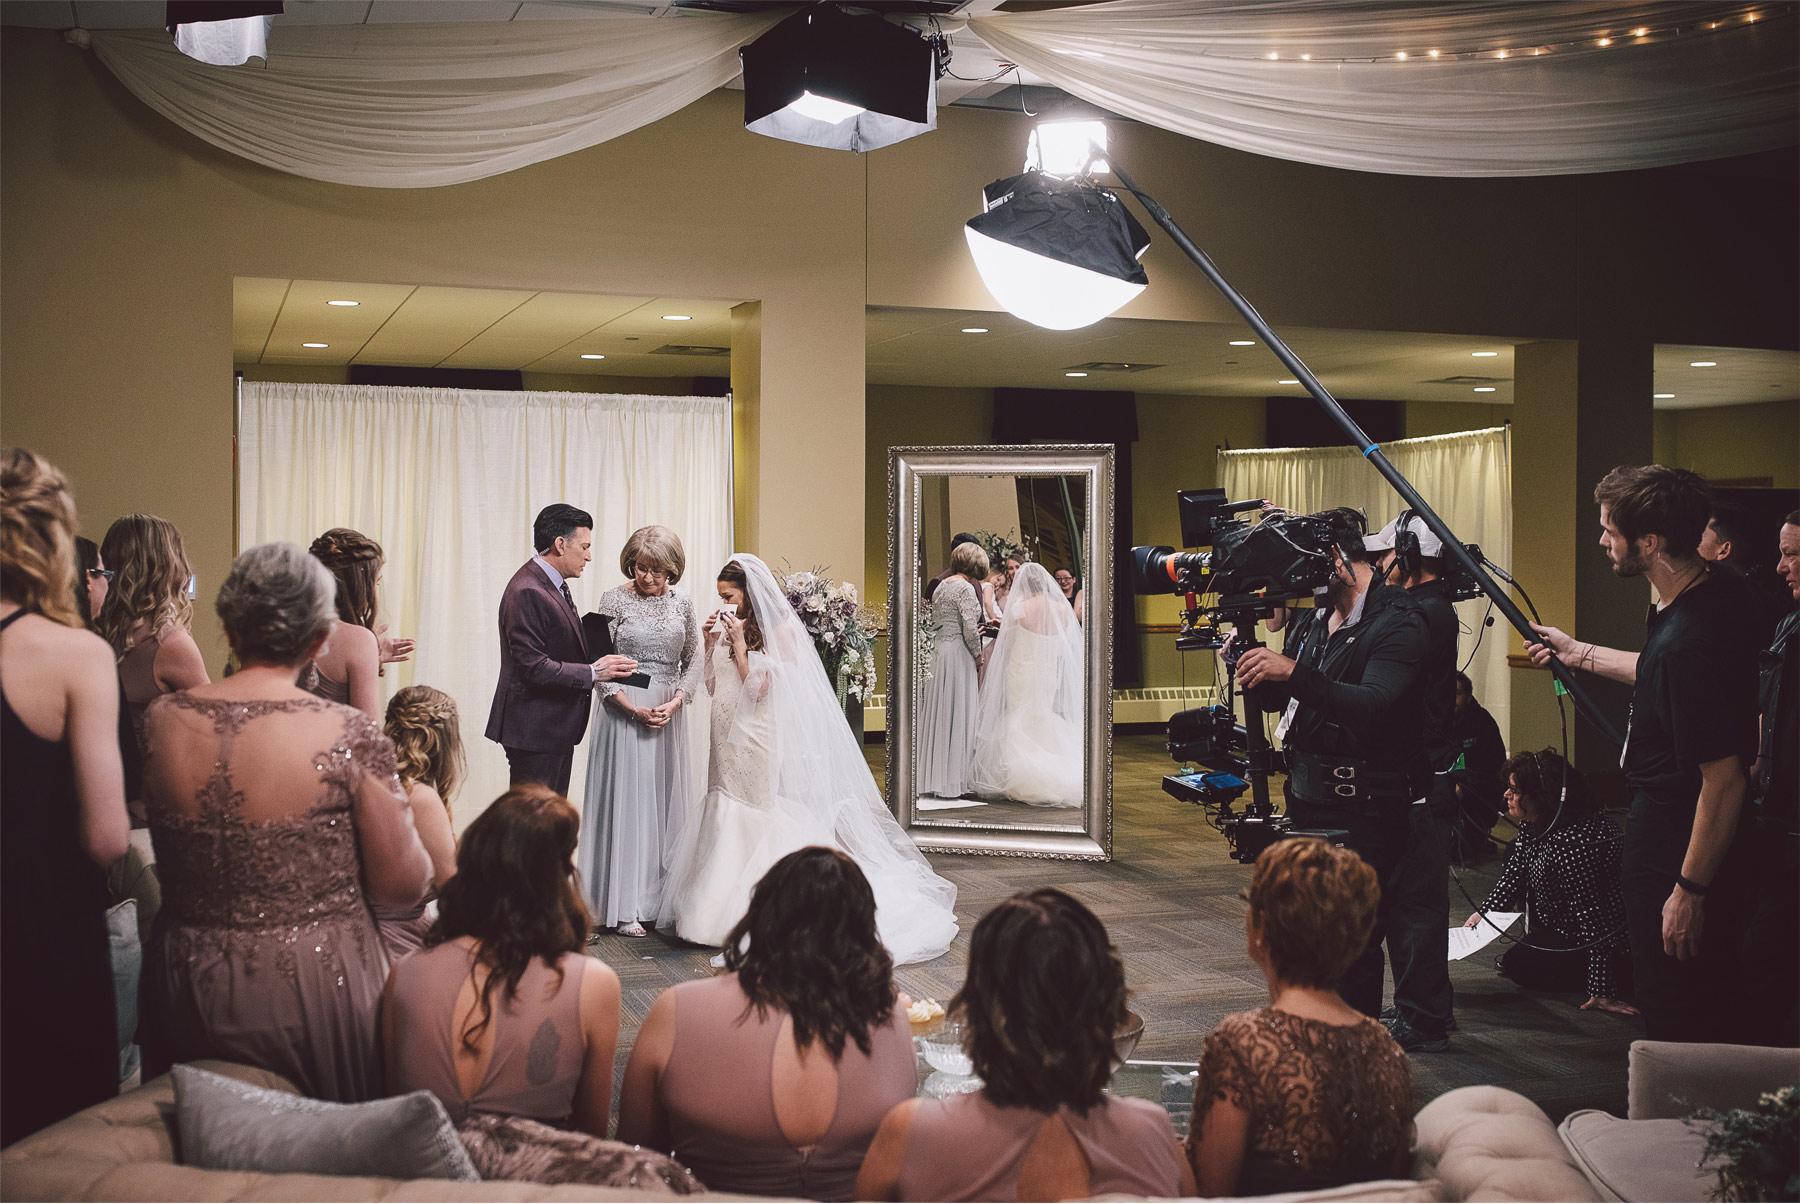 10-Andrew-Vick-Photography-My-Great-Big-Live-Wedding-with-David-Tutera-Behind-the-Scenes-Minnesota-Union-Depot-Saint-Paul-Dress-Surprise.jpg.jpg